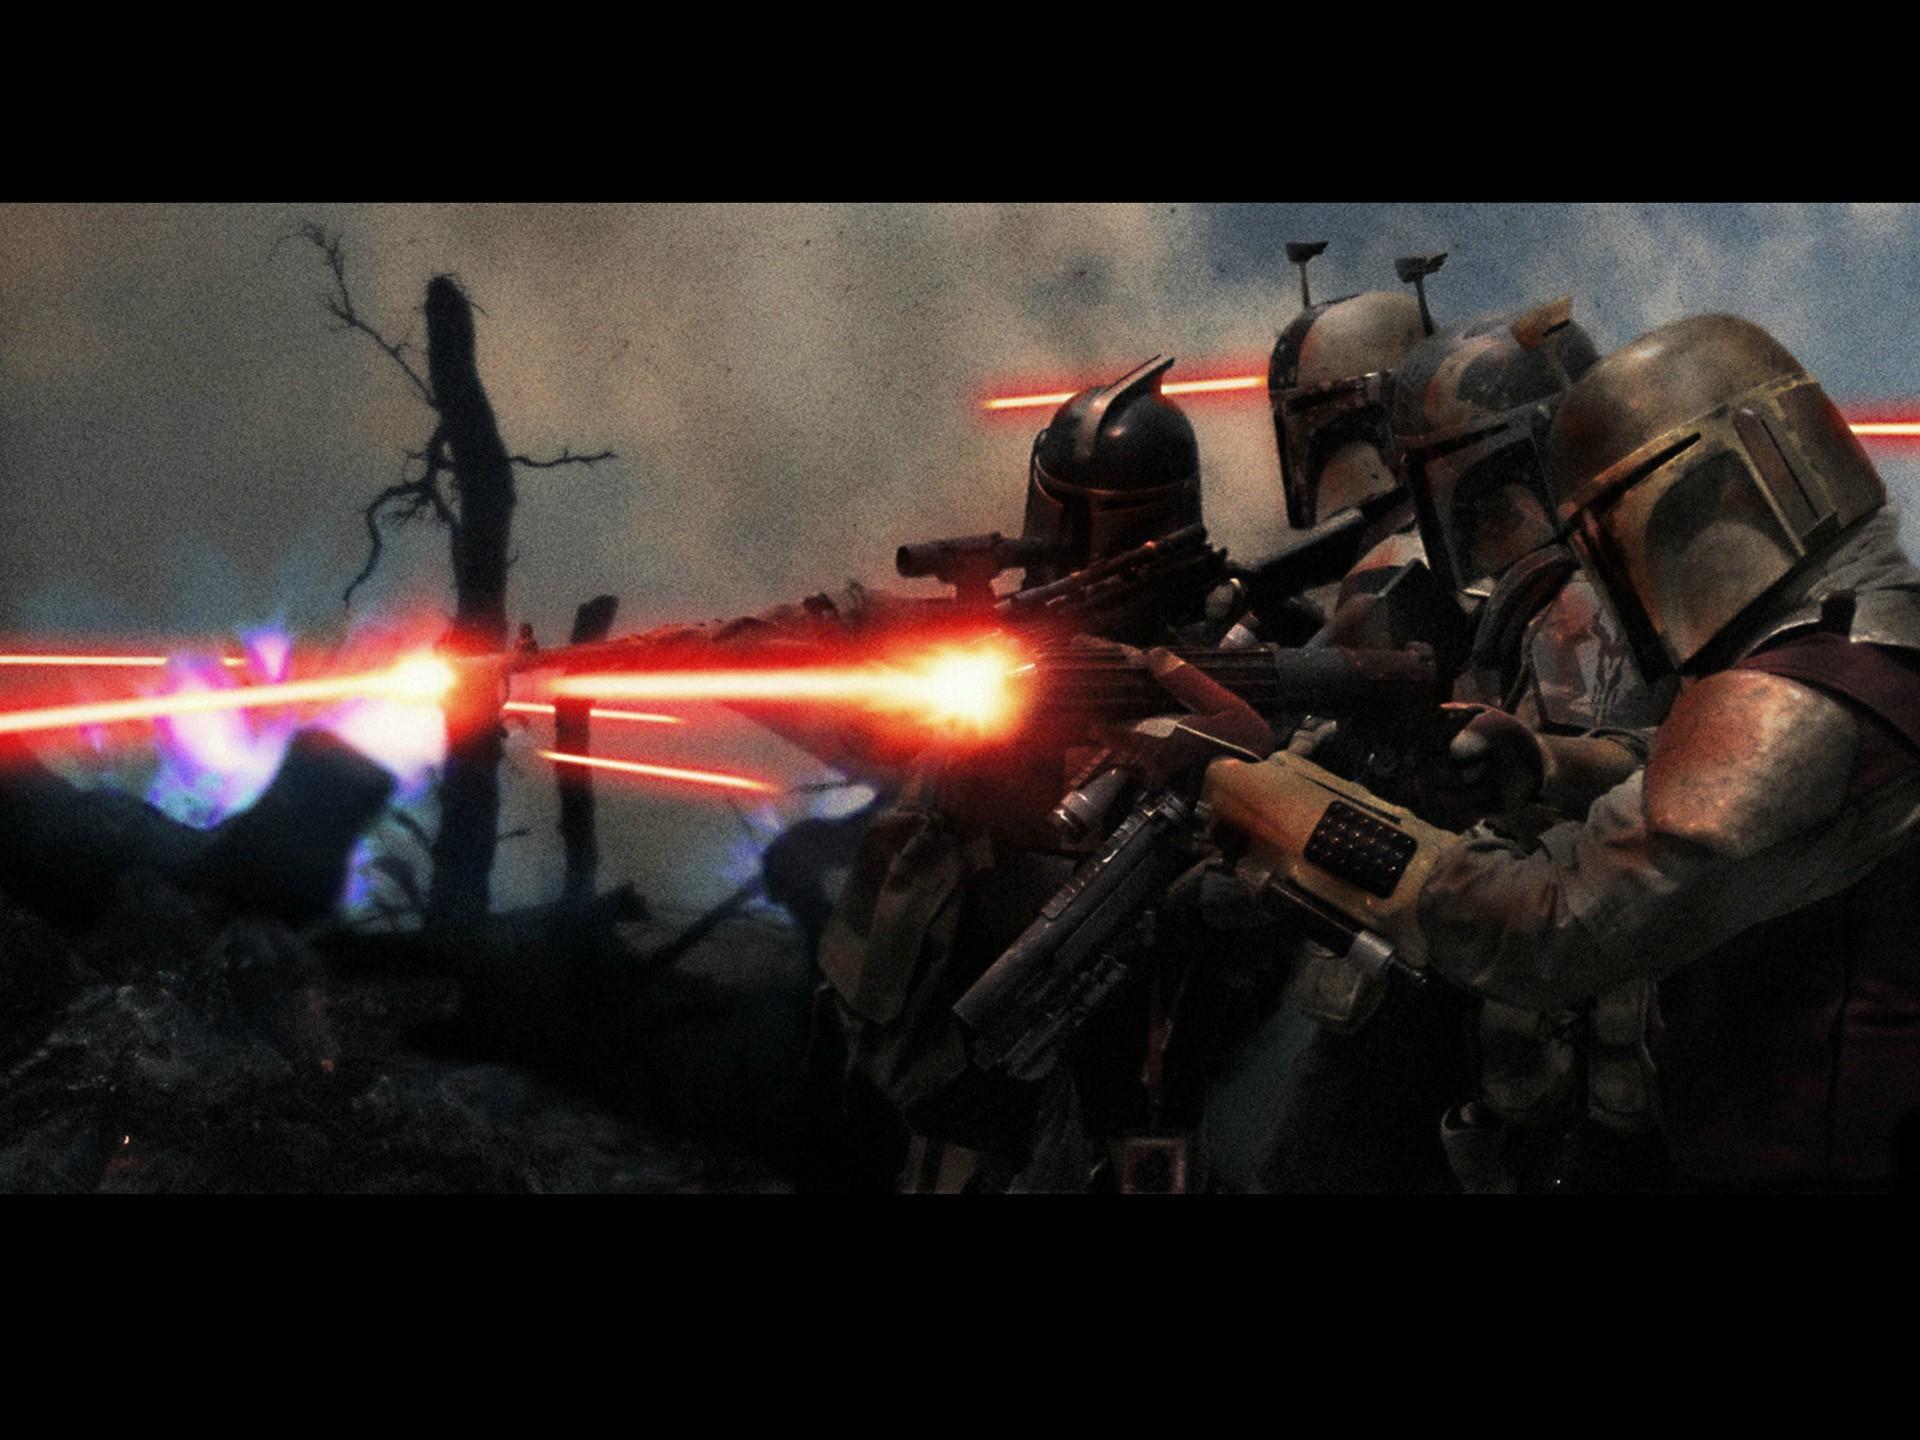 Star Wars Wallpaper Dump – Album on Imgur. Hd WallpaperStar Wars  WallpaperWallpapersStar Wars Boba FettJango …